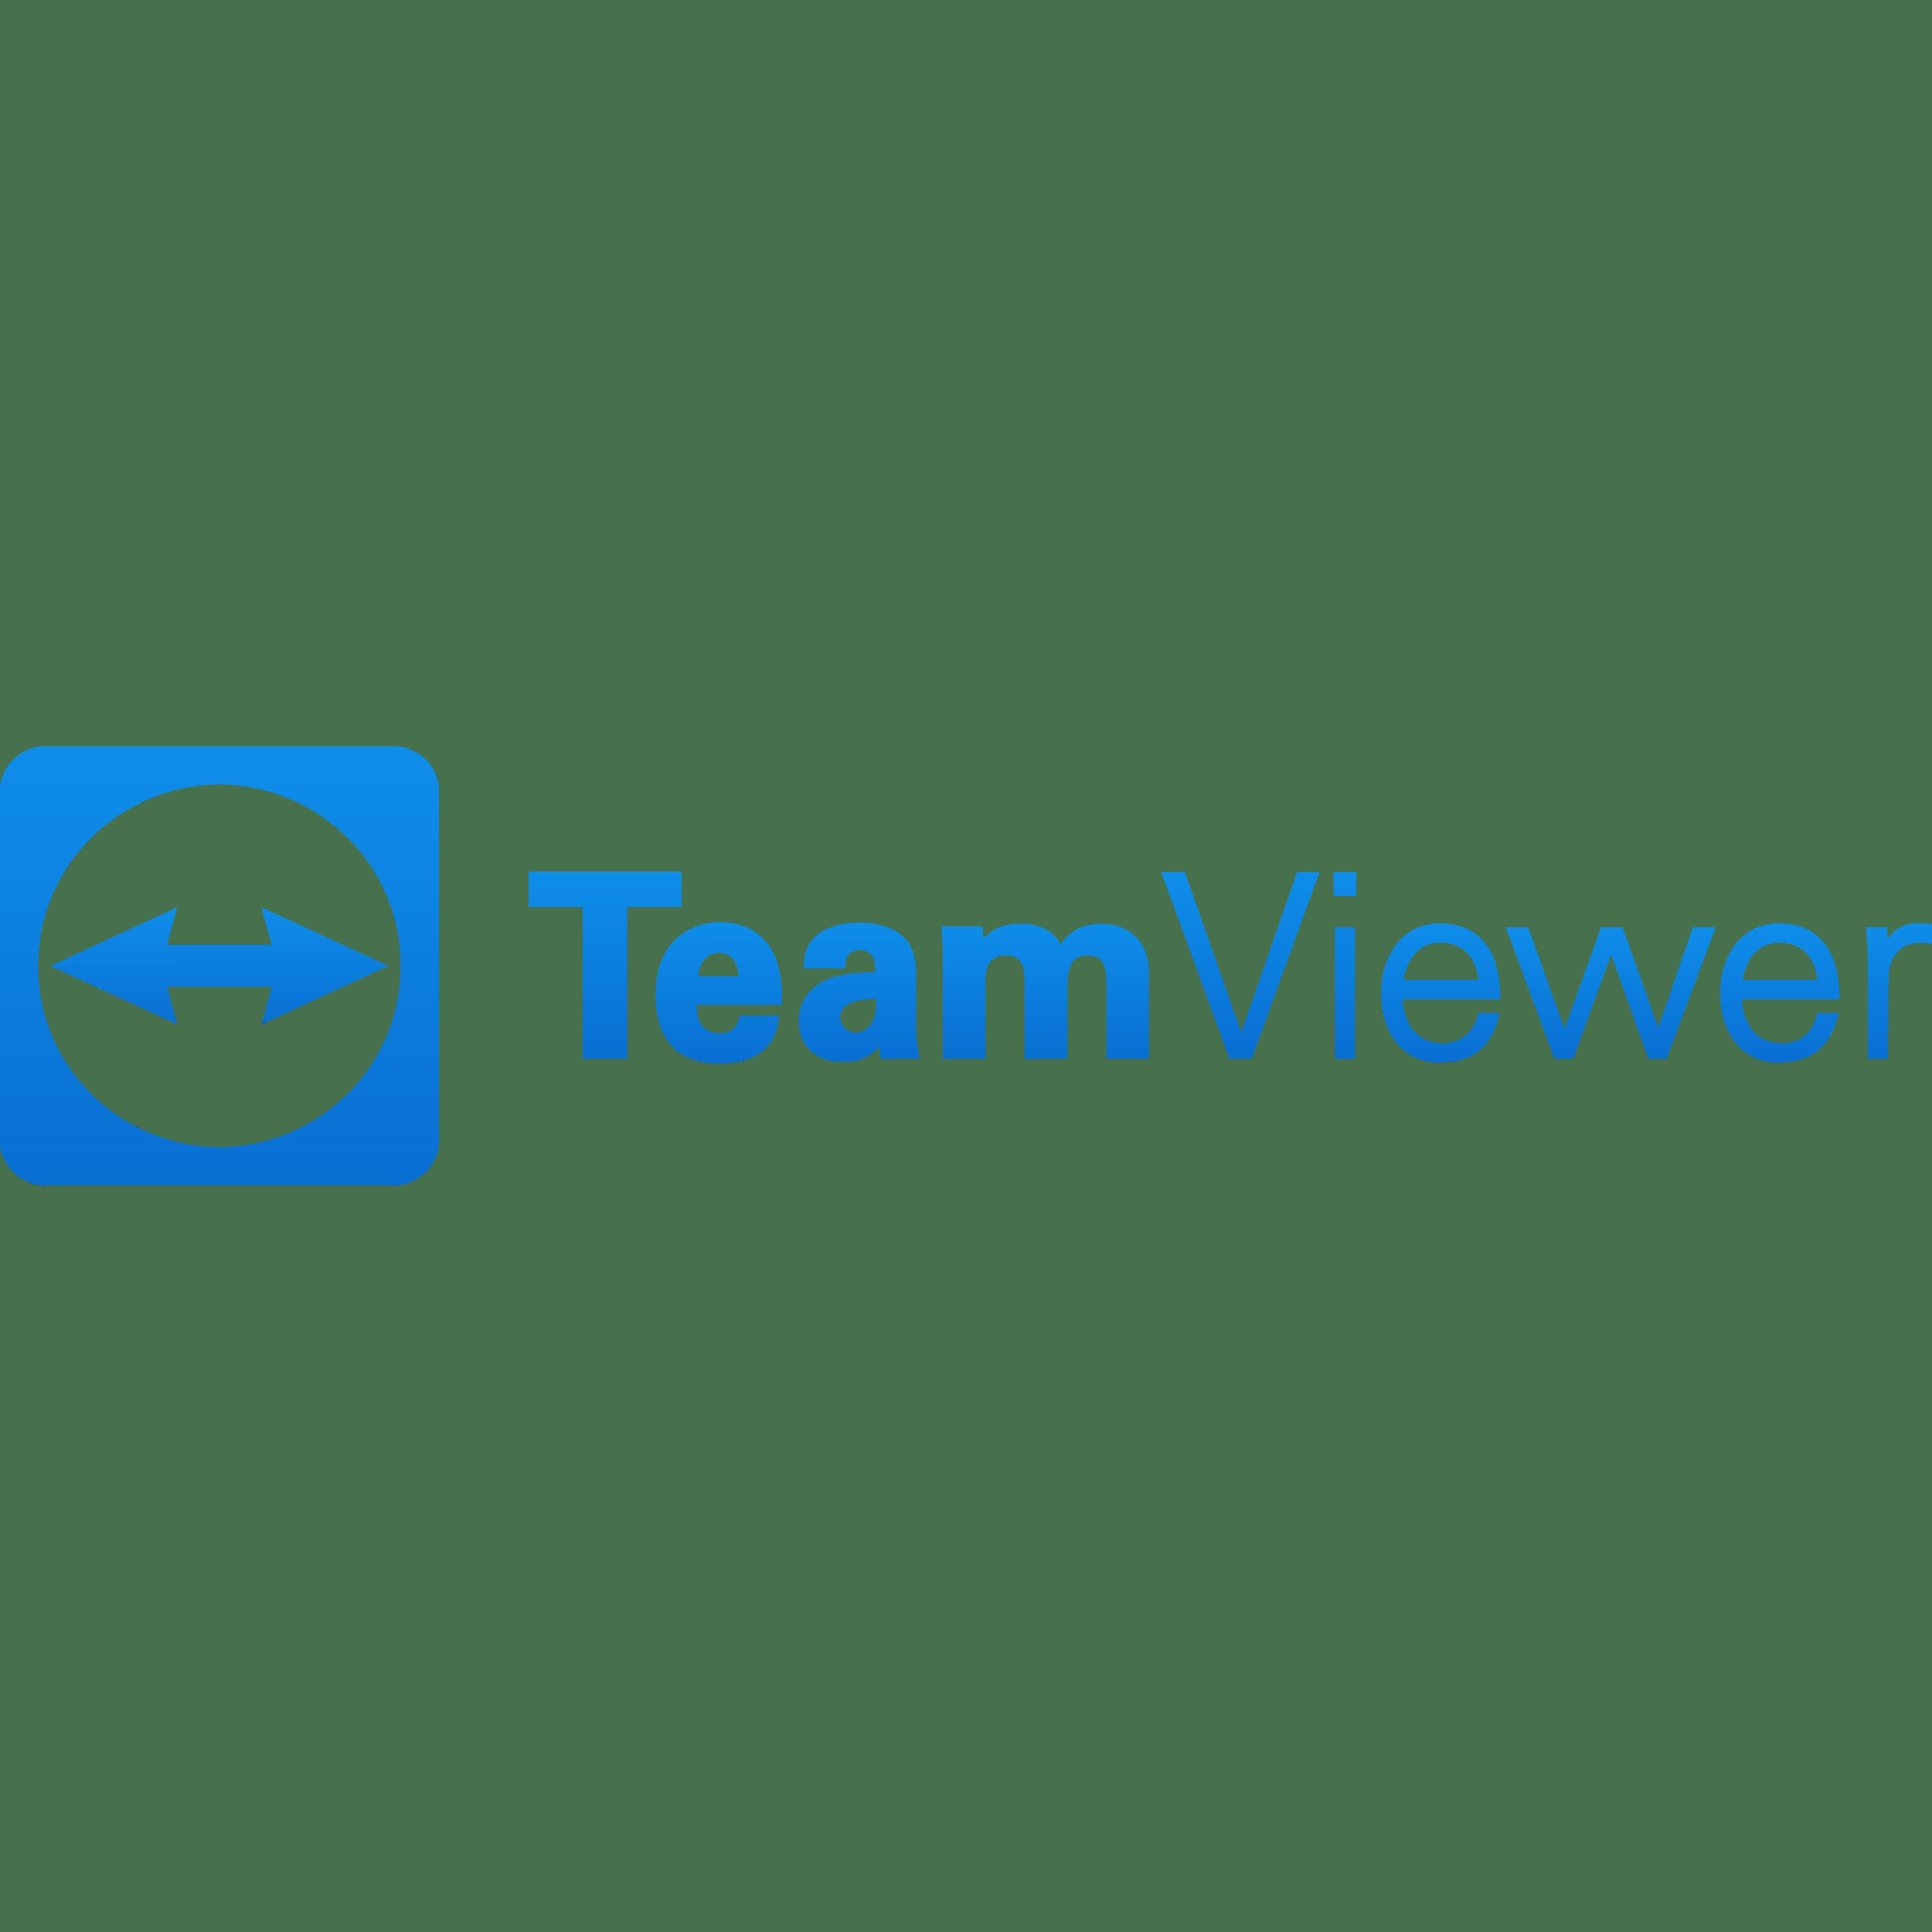 TeamViewer Aktienanalyse | Bilanzanalyse - Fundamentale Aktienanalyse